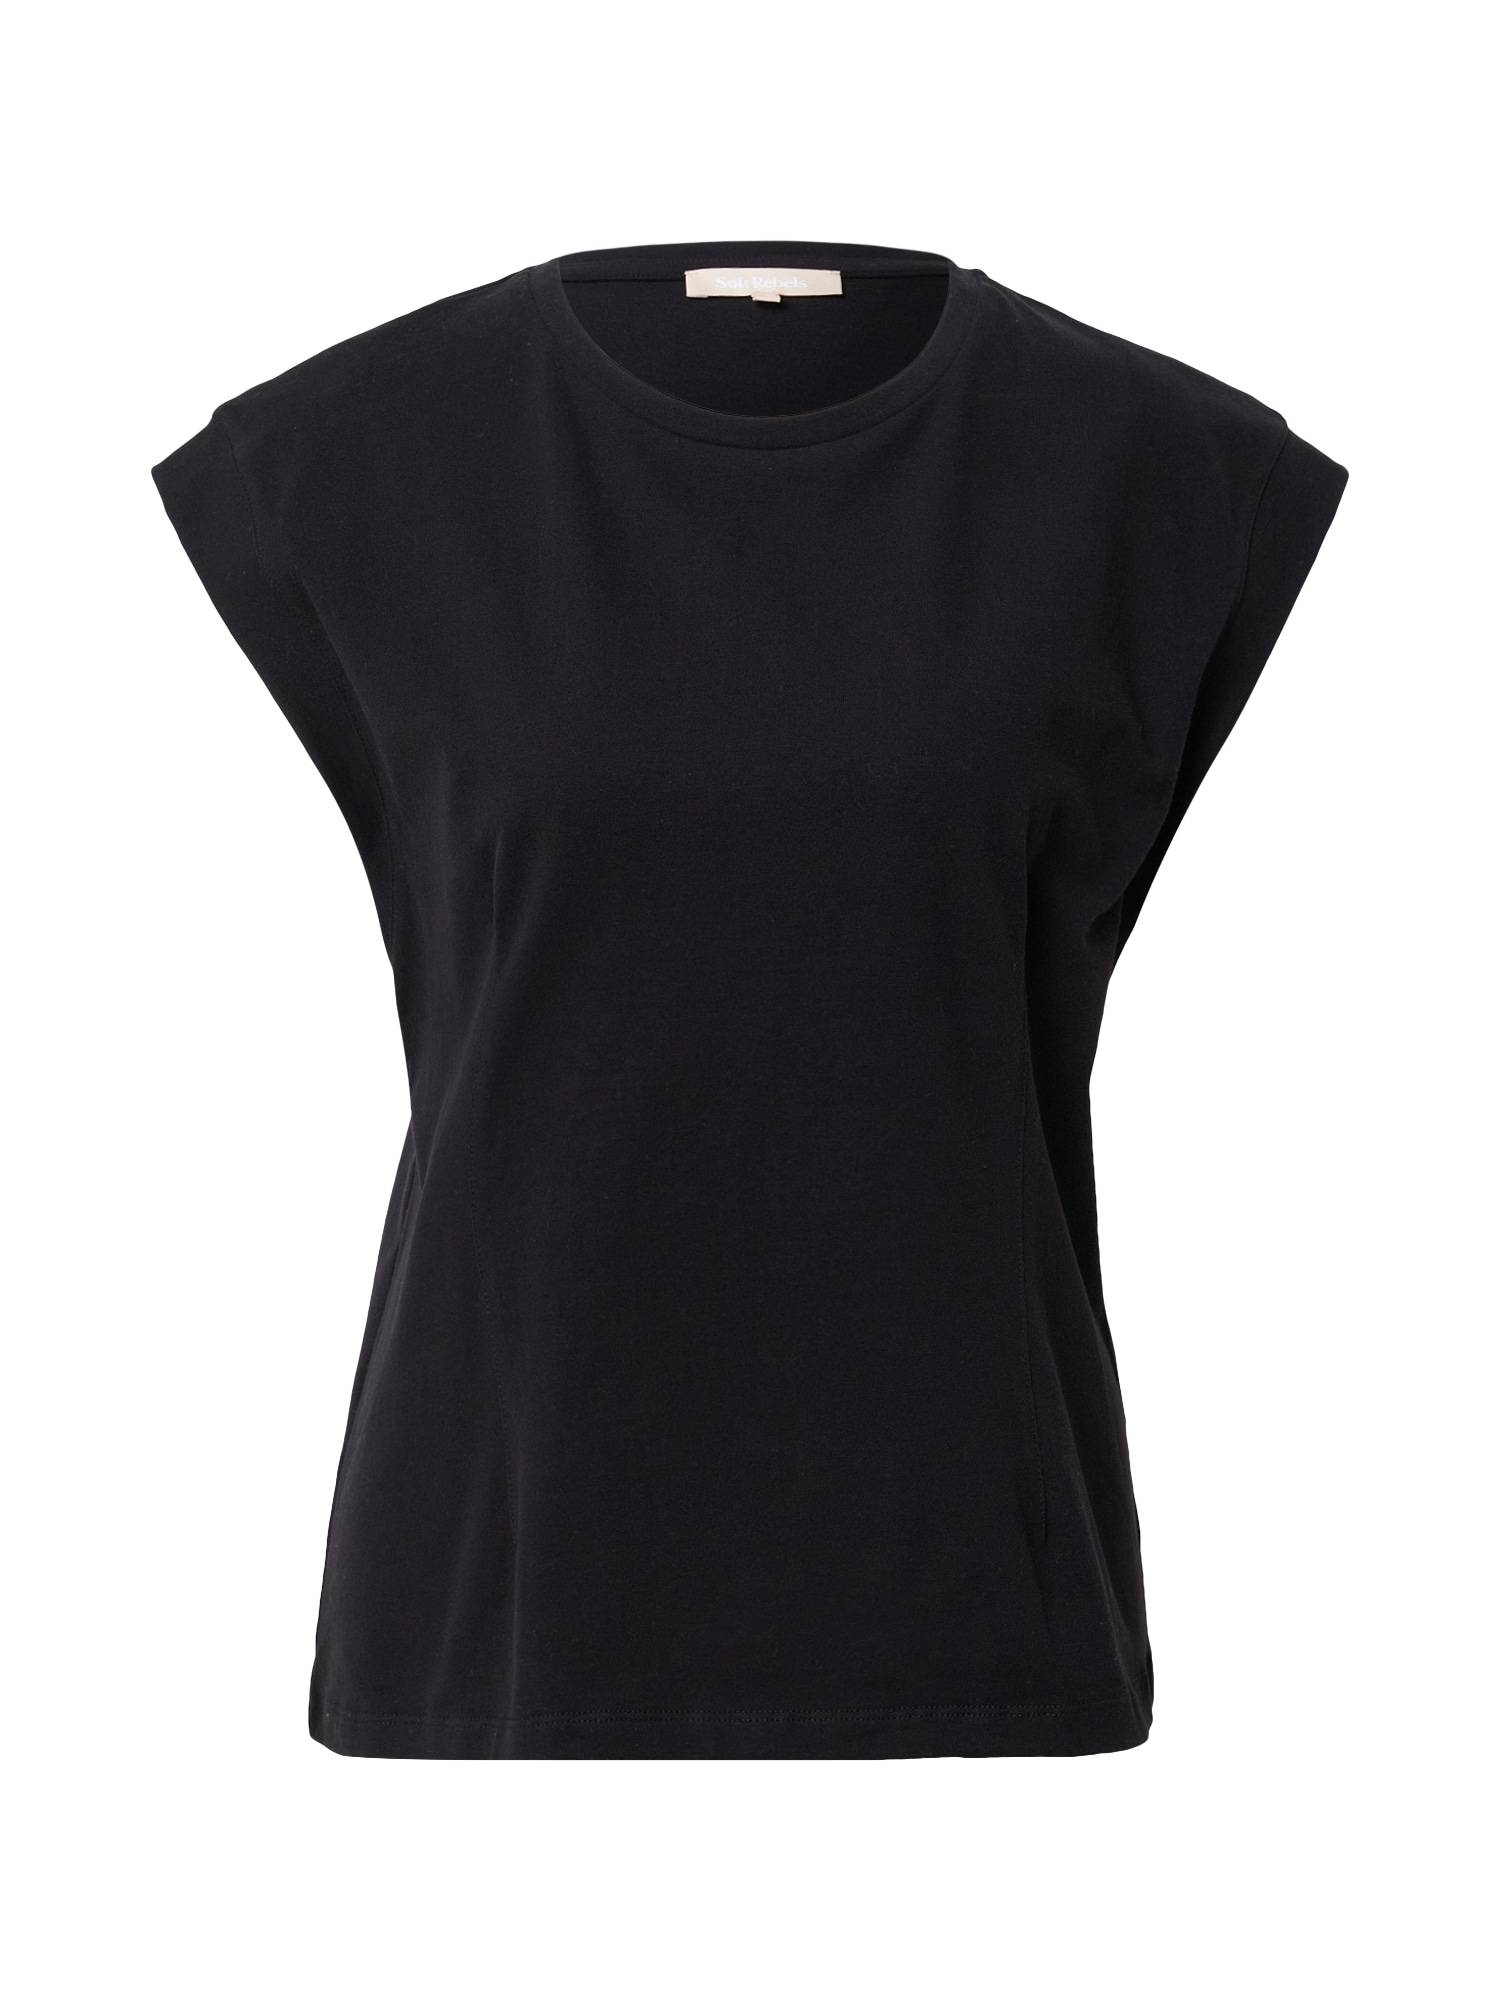 Soft Rebels T-shirt 'Winona'  - Noir - Taille: M - female